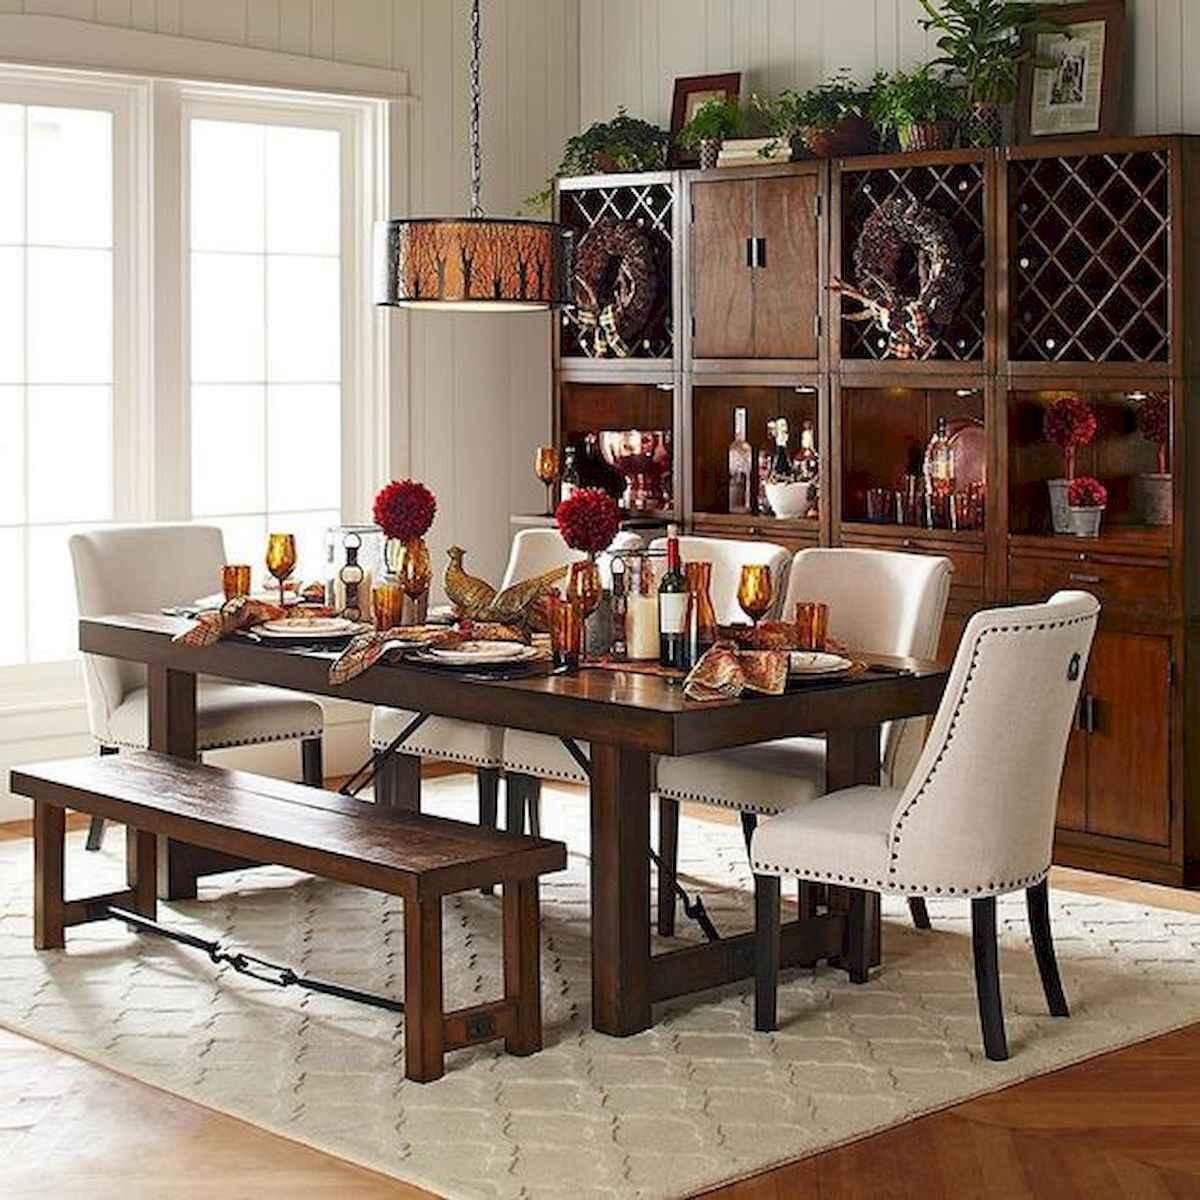 80 Elegant Furniture For Modern Farmhouse Living Room Decor Ideas (76)